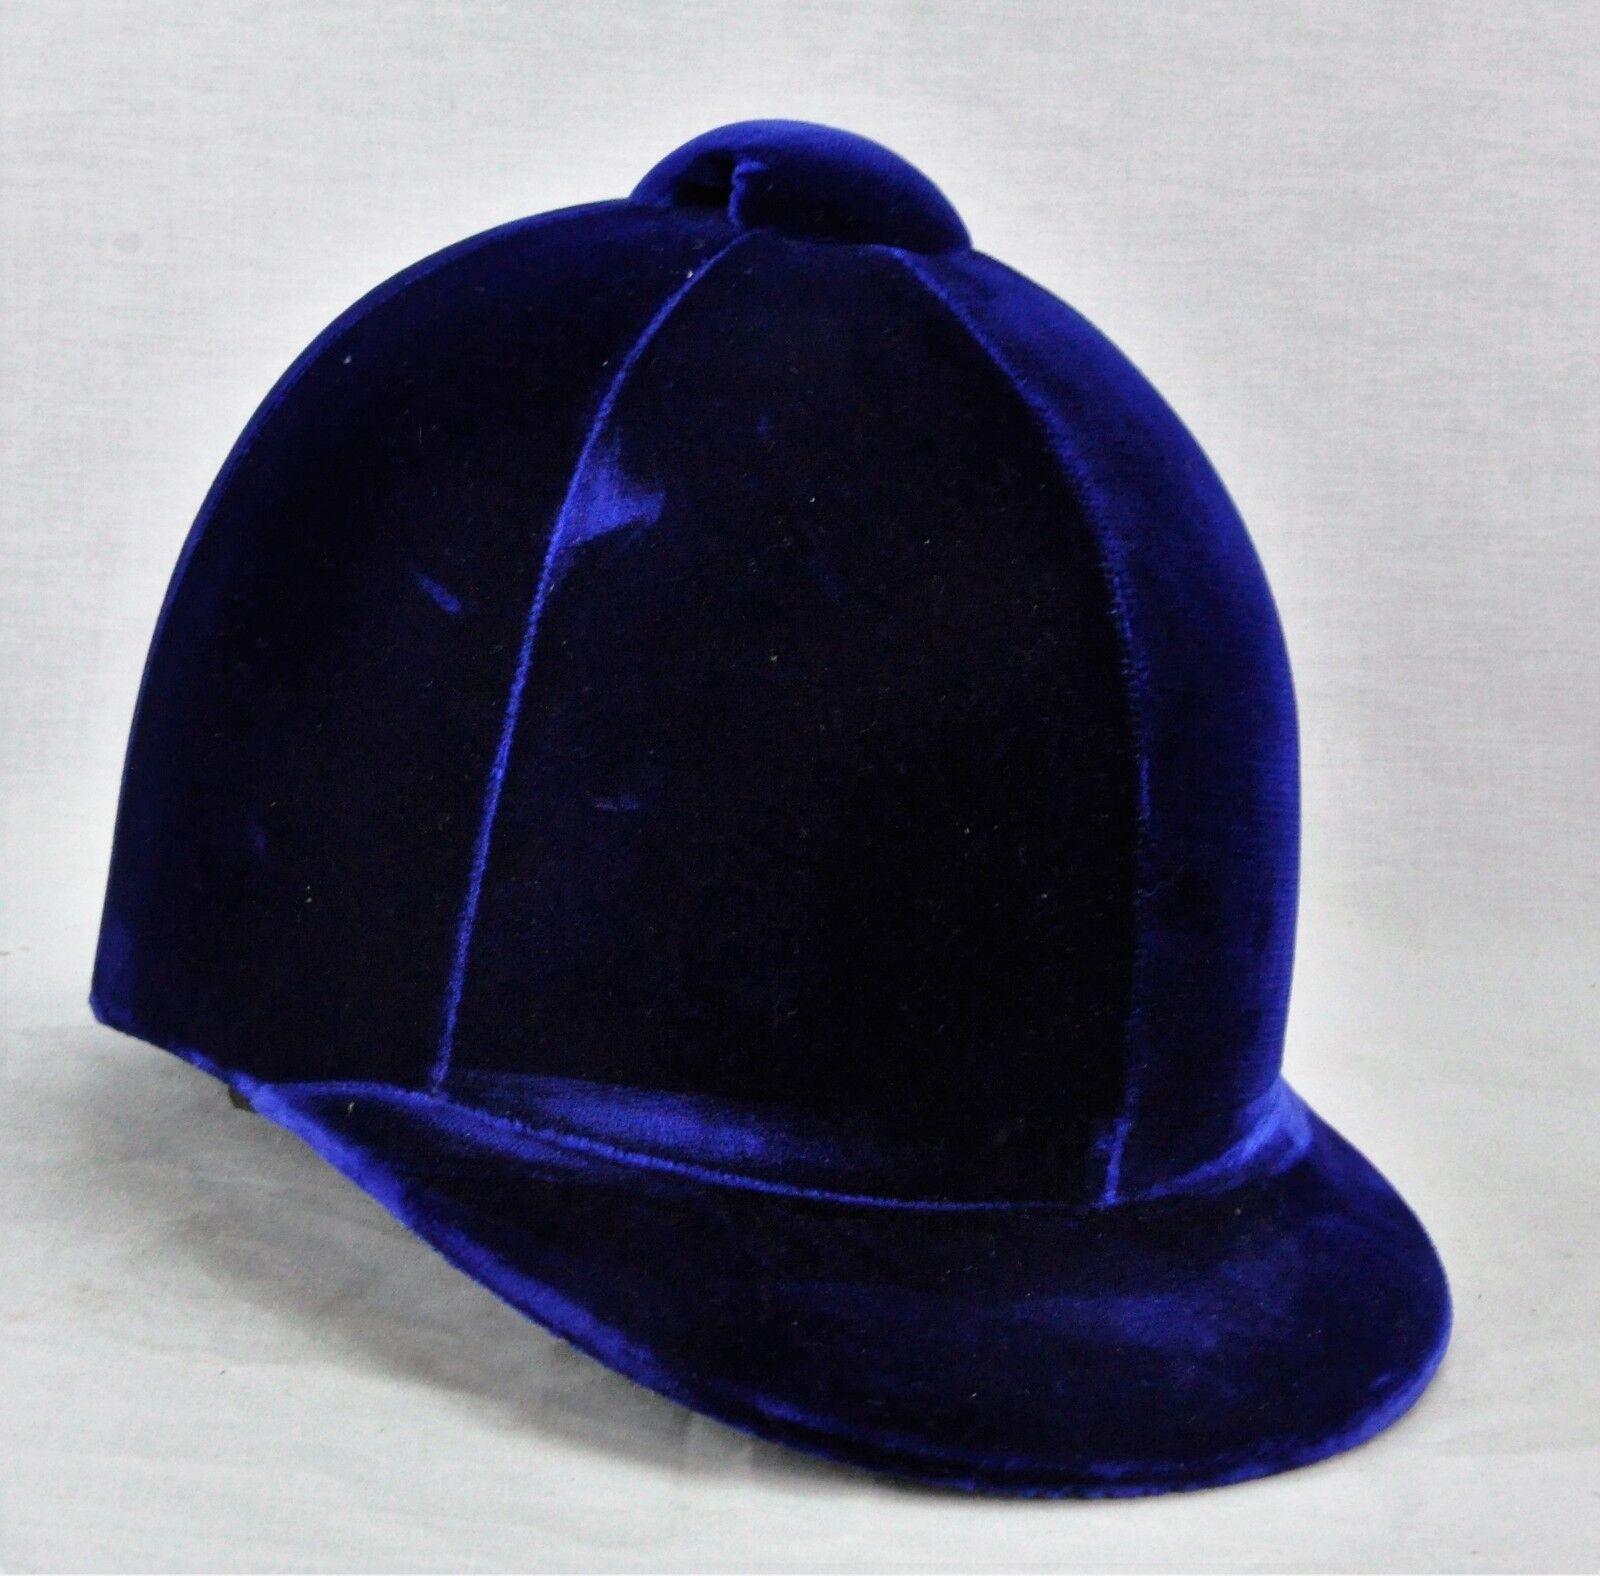 Jockey Derby Caballo Rave Sombrero Gorra. Vintage, nunca usado, En Origina. (BI MK 181010)